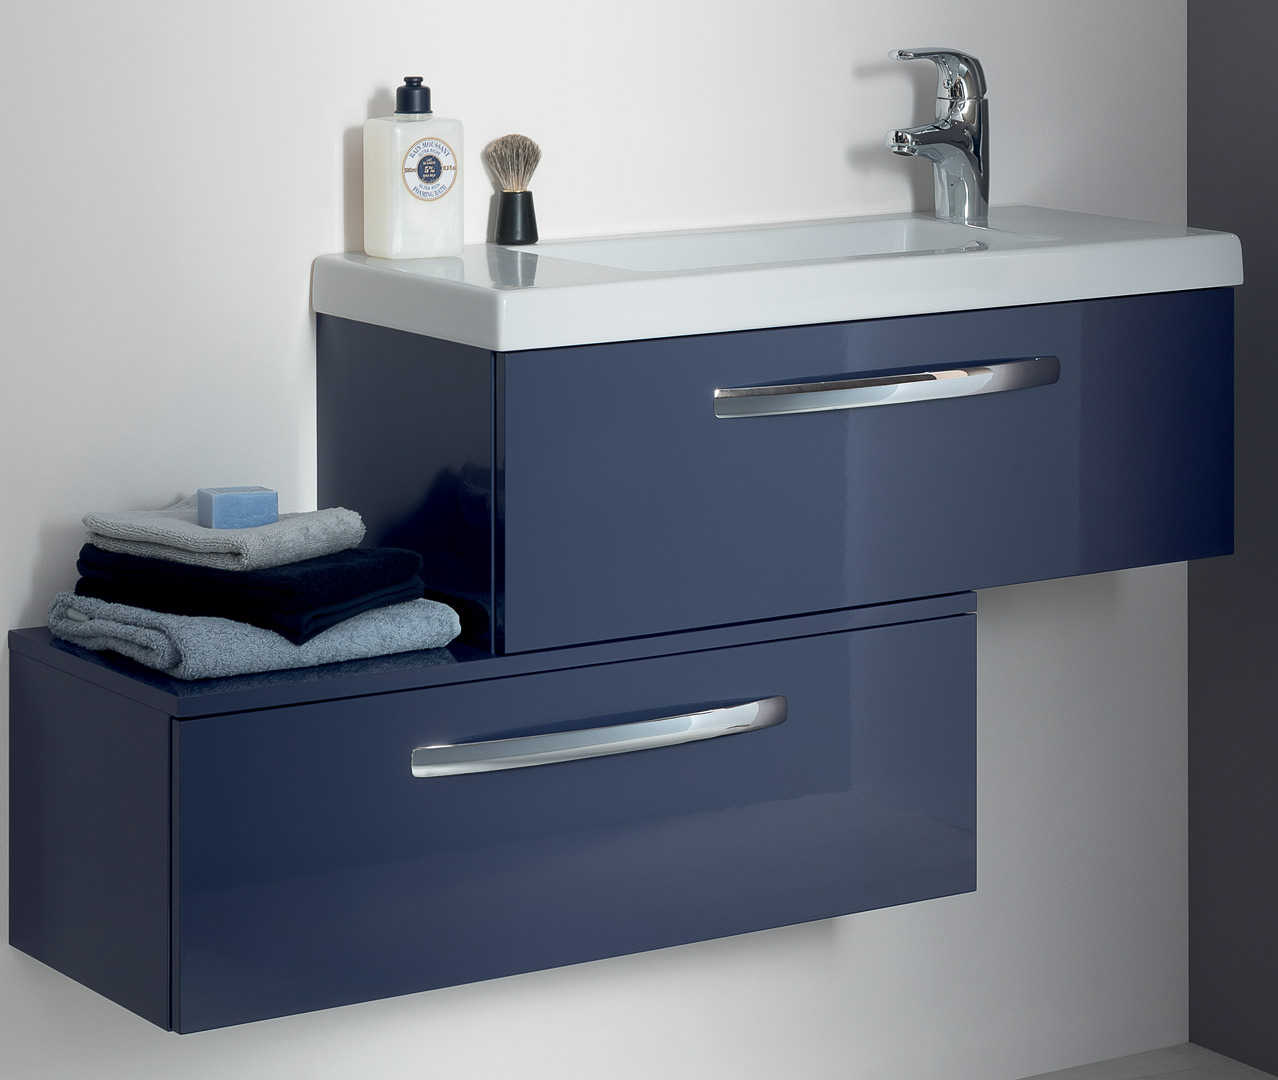 Gamme italik petite salle de bain design sanijura for Configurer une salle de bain